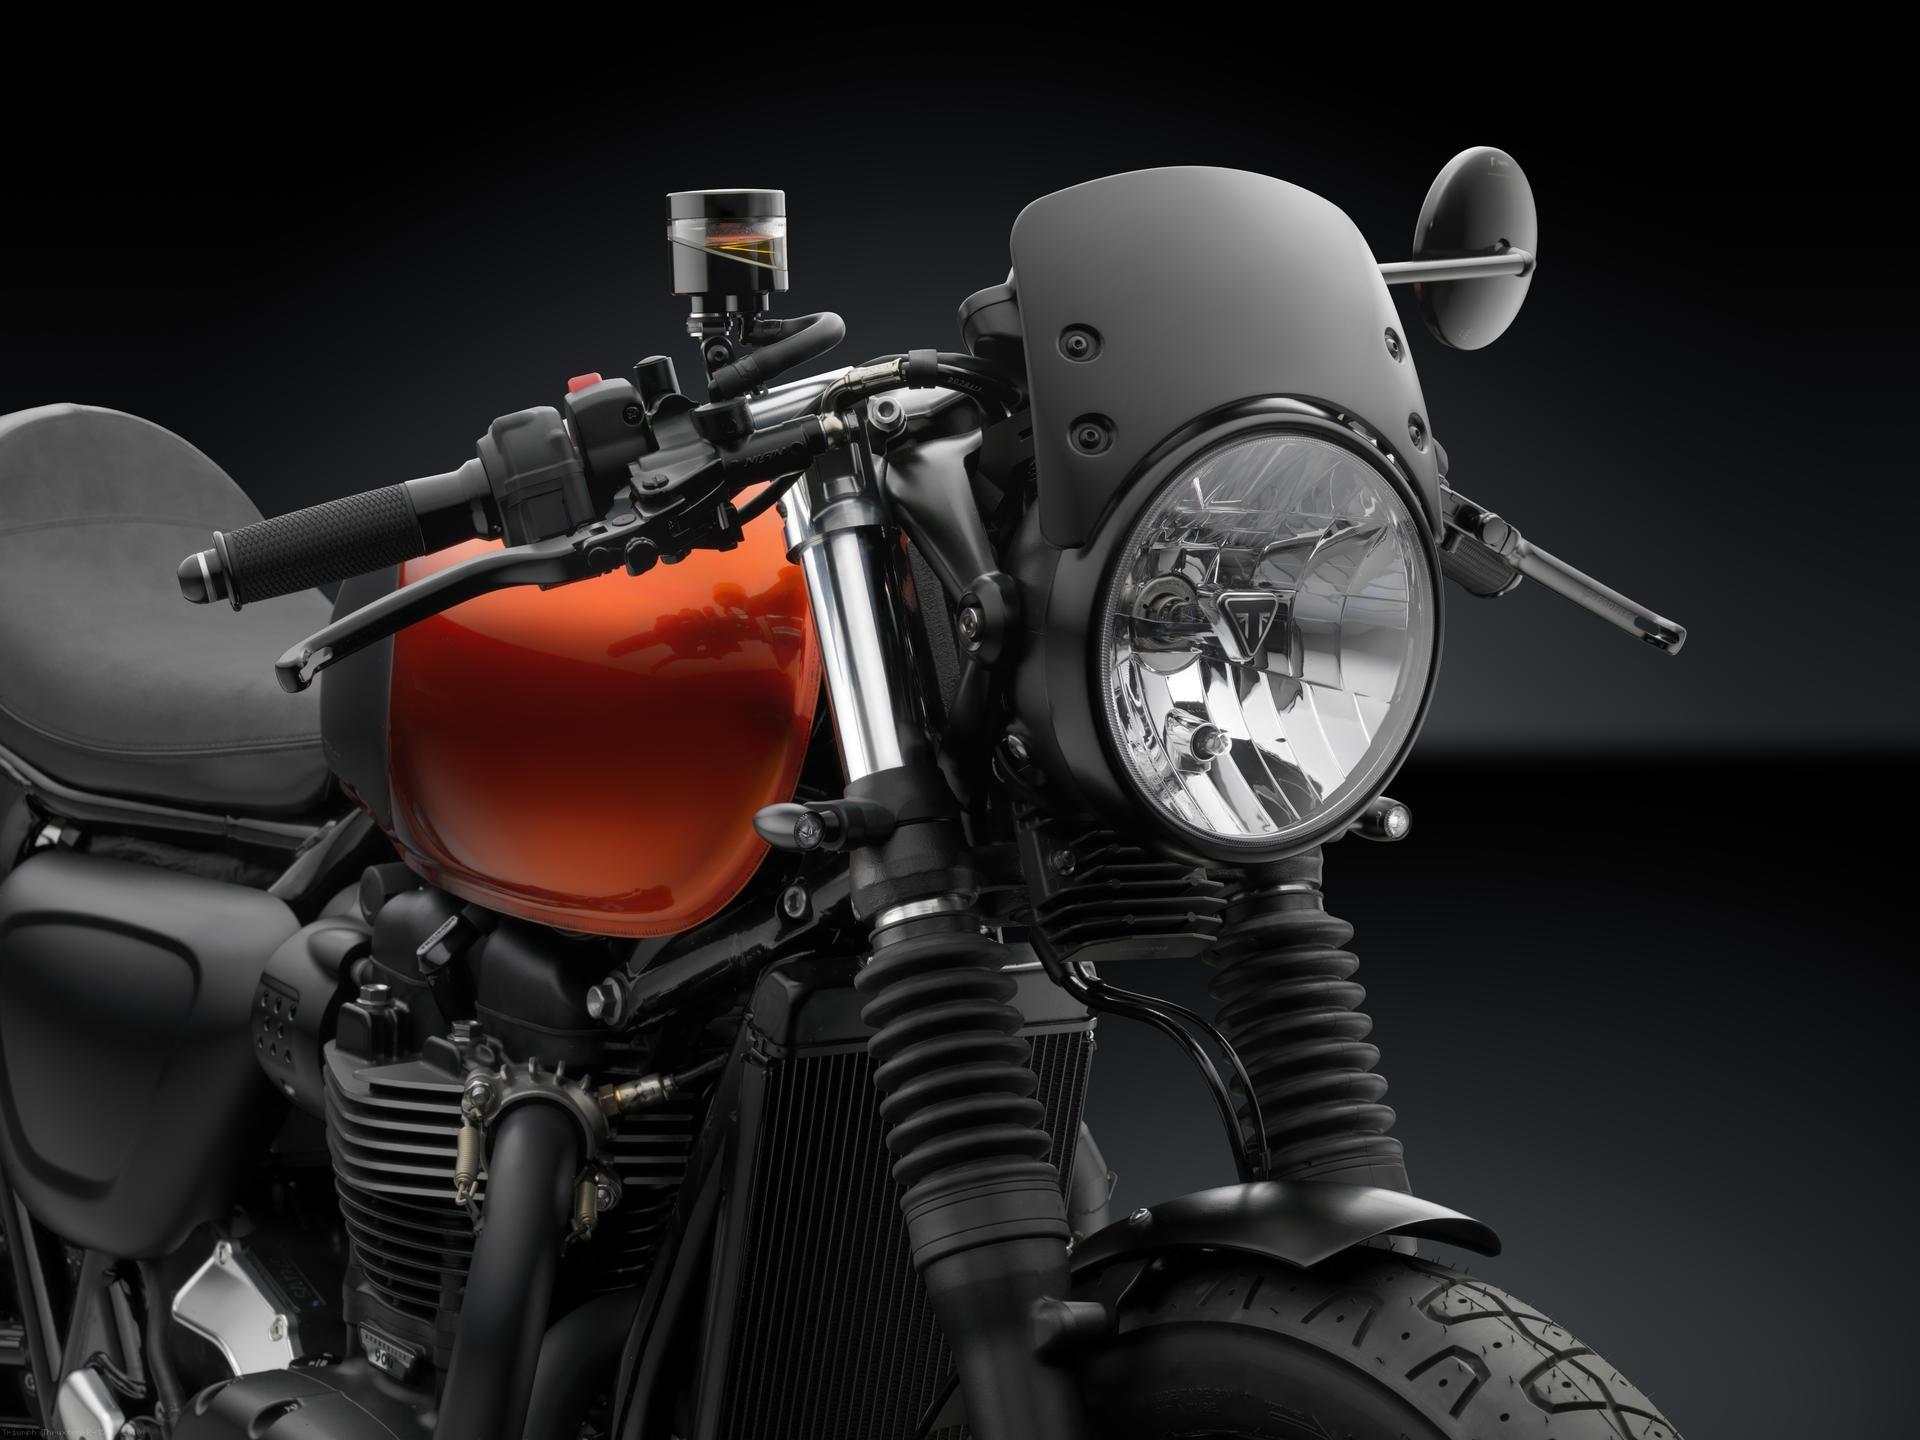 BMW Maintenance Program >> Low Height Aluminum Headlight Fairing by Rizoma Triumph ...